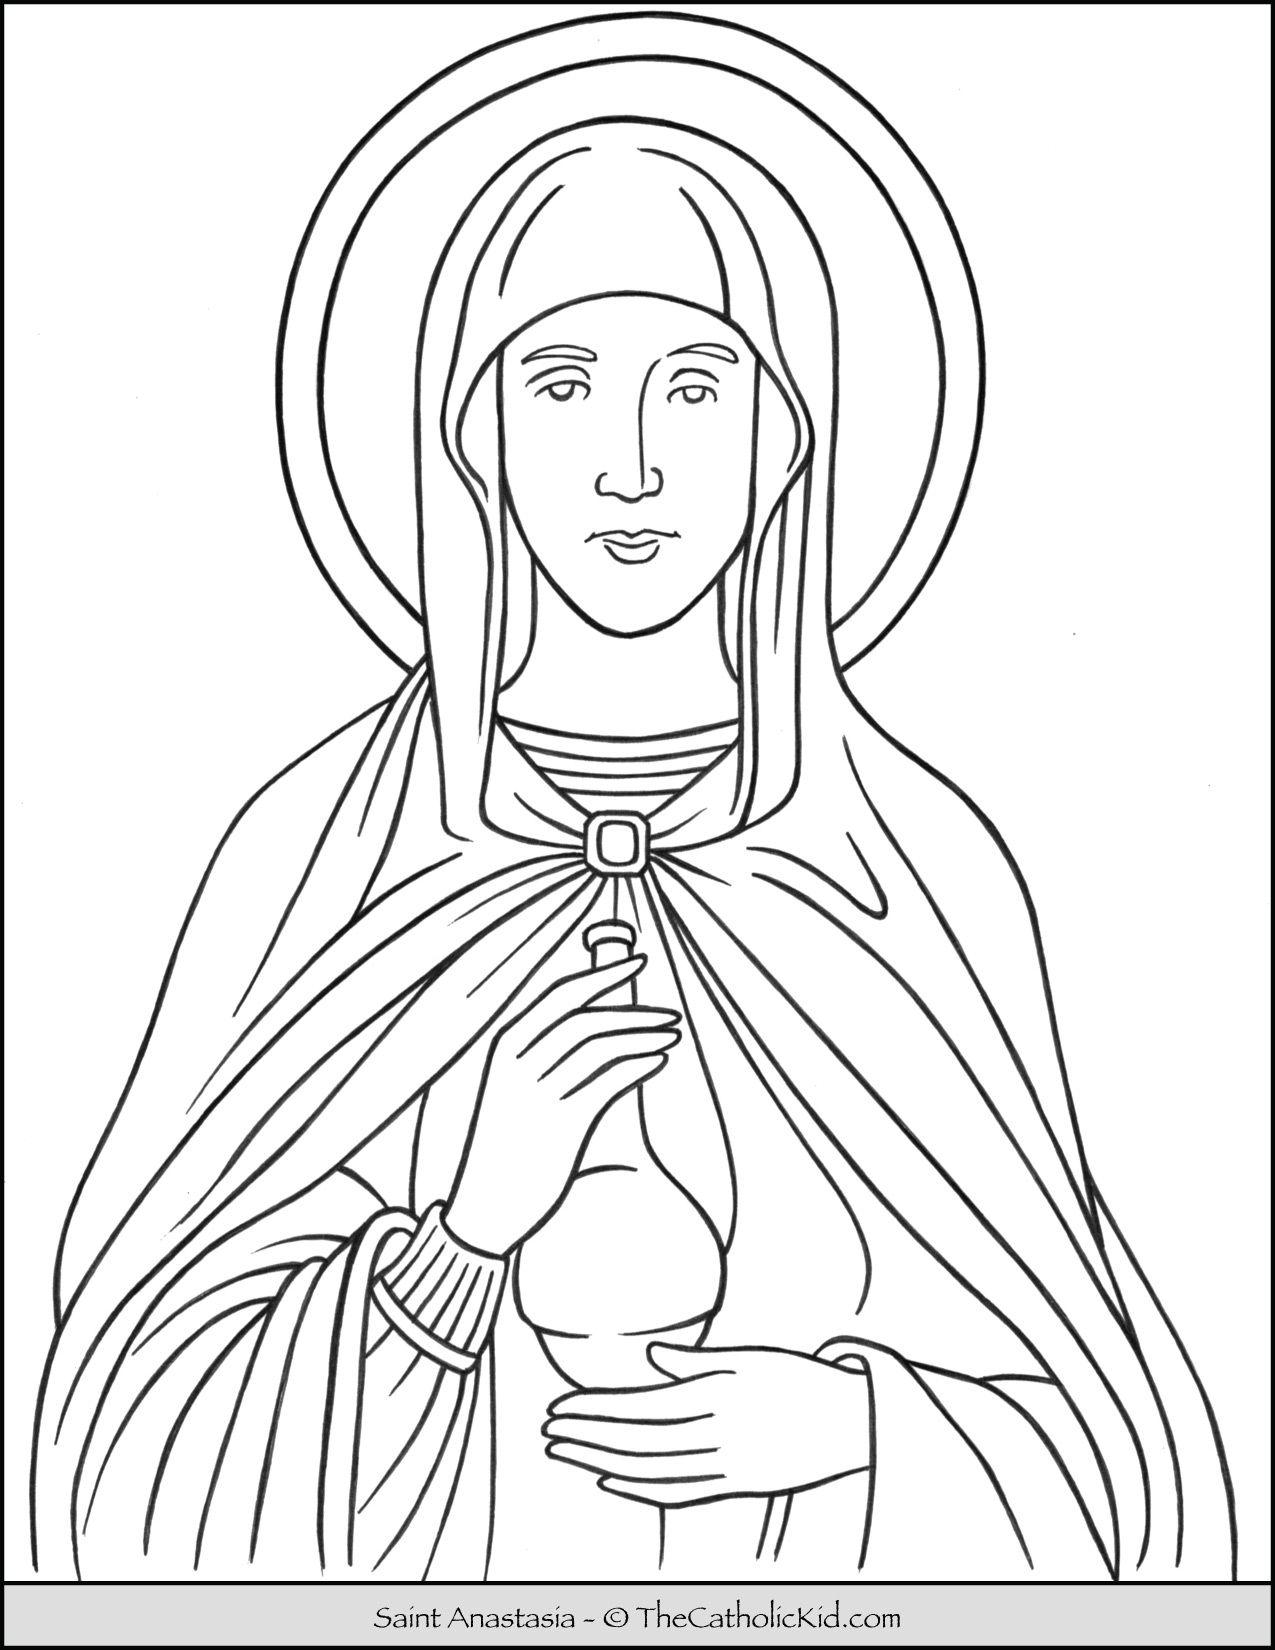 Saint Anastasia Coloring Page Thecatholickid Com Jesus Coloring Pages Coloring Pages Cat Coloring Page